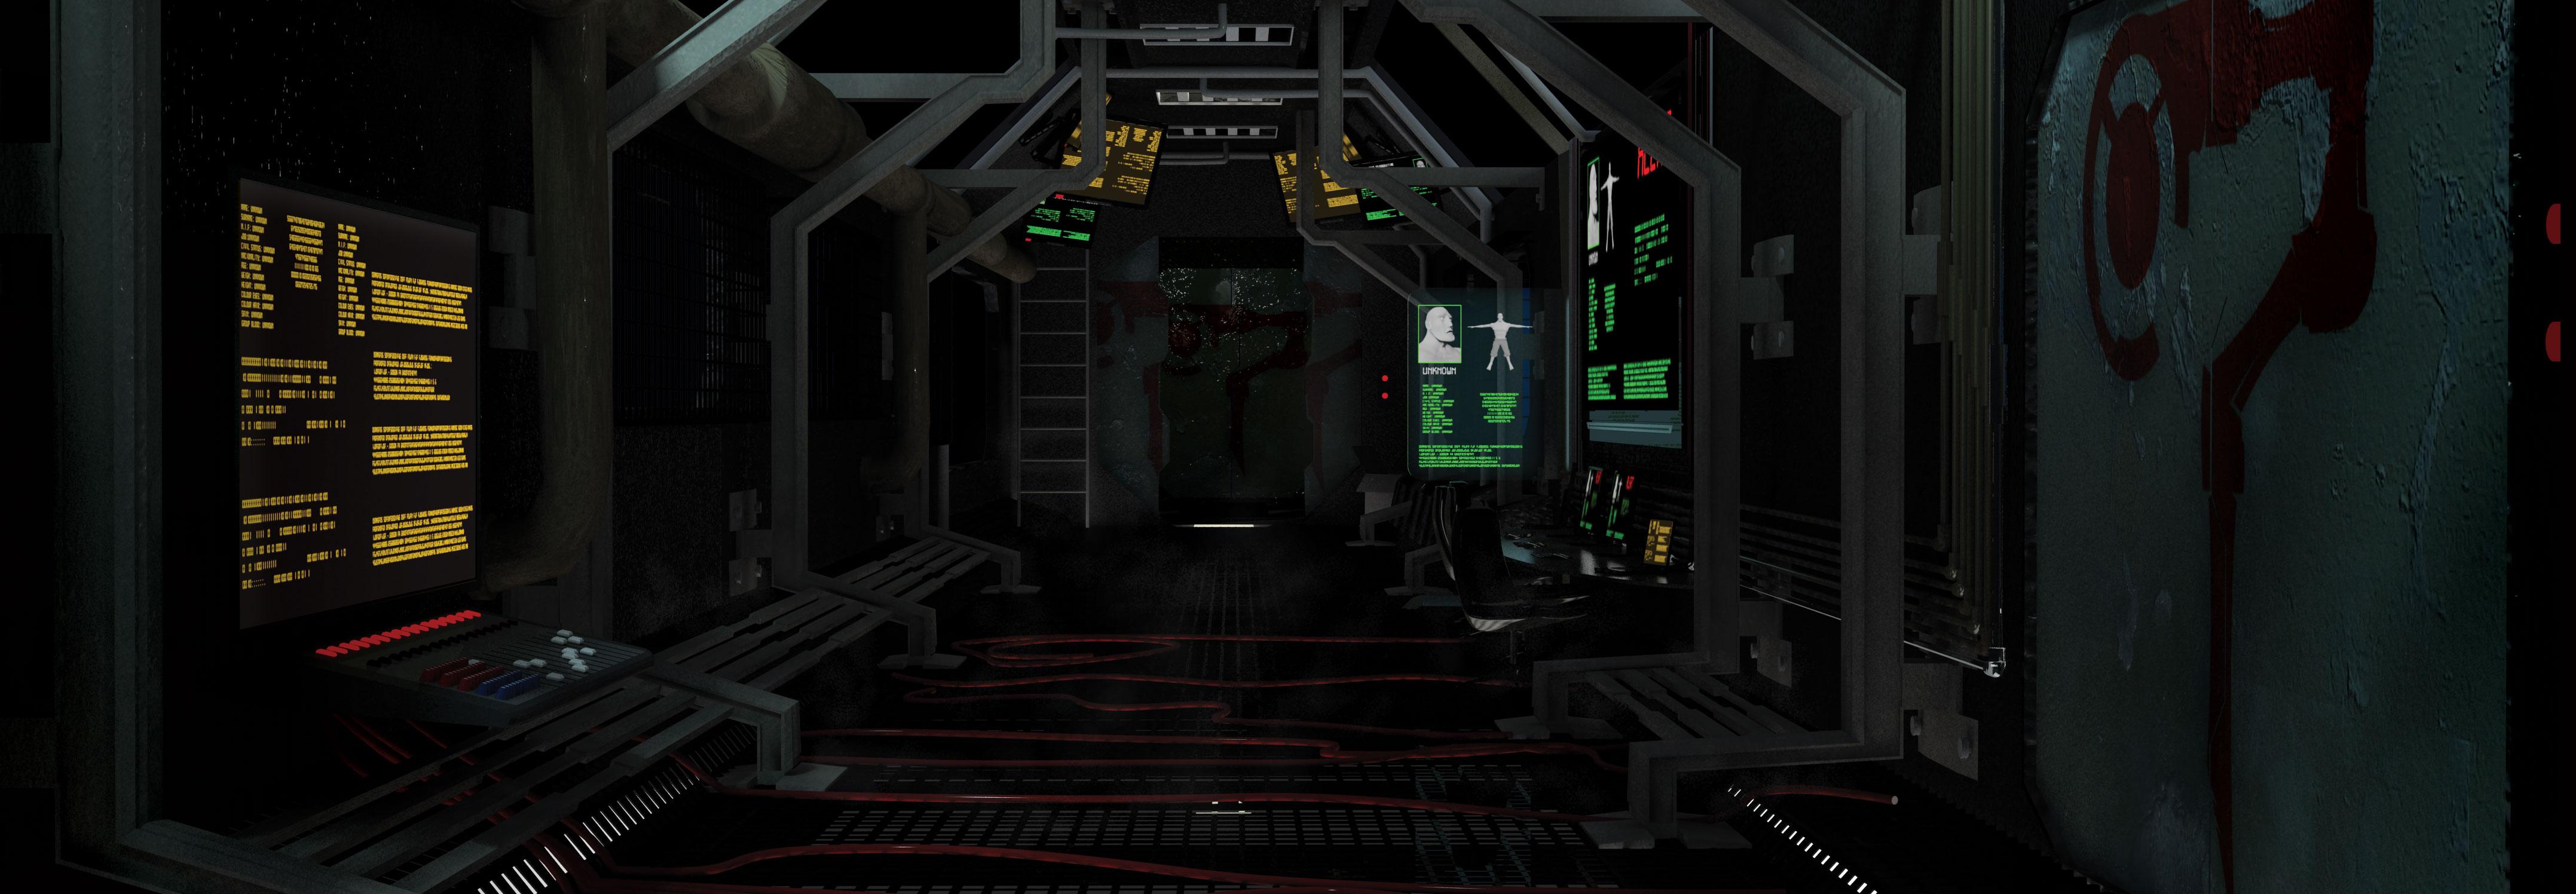 Interior De Ventana De Nave Espacial: Interior Nave Espacial